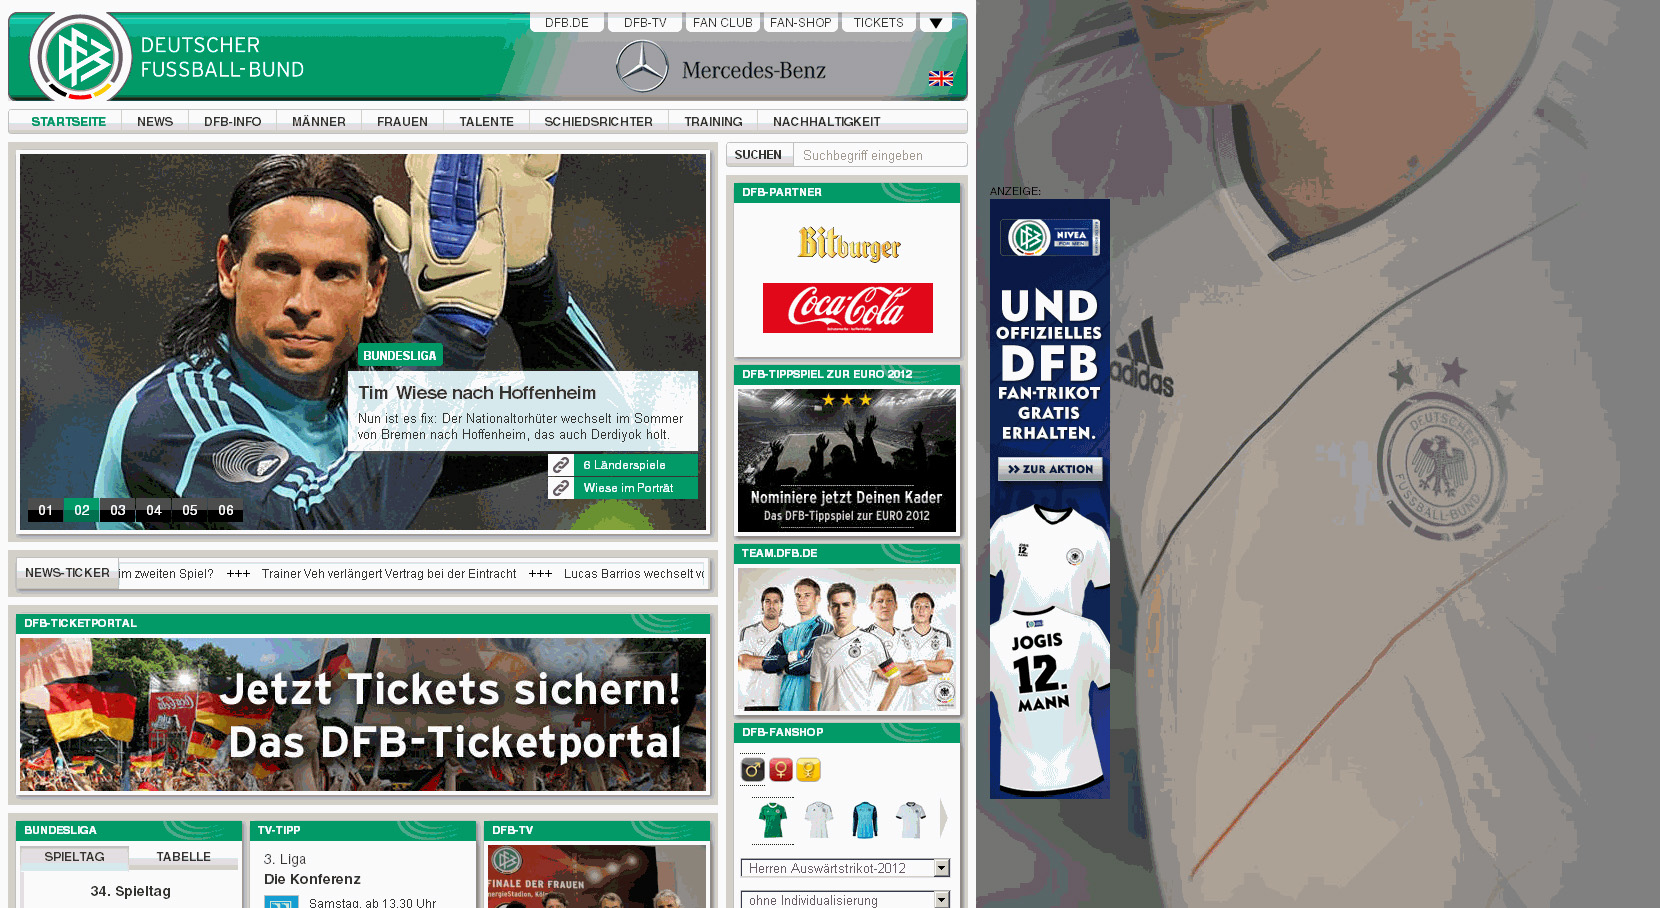 DFB-Website